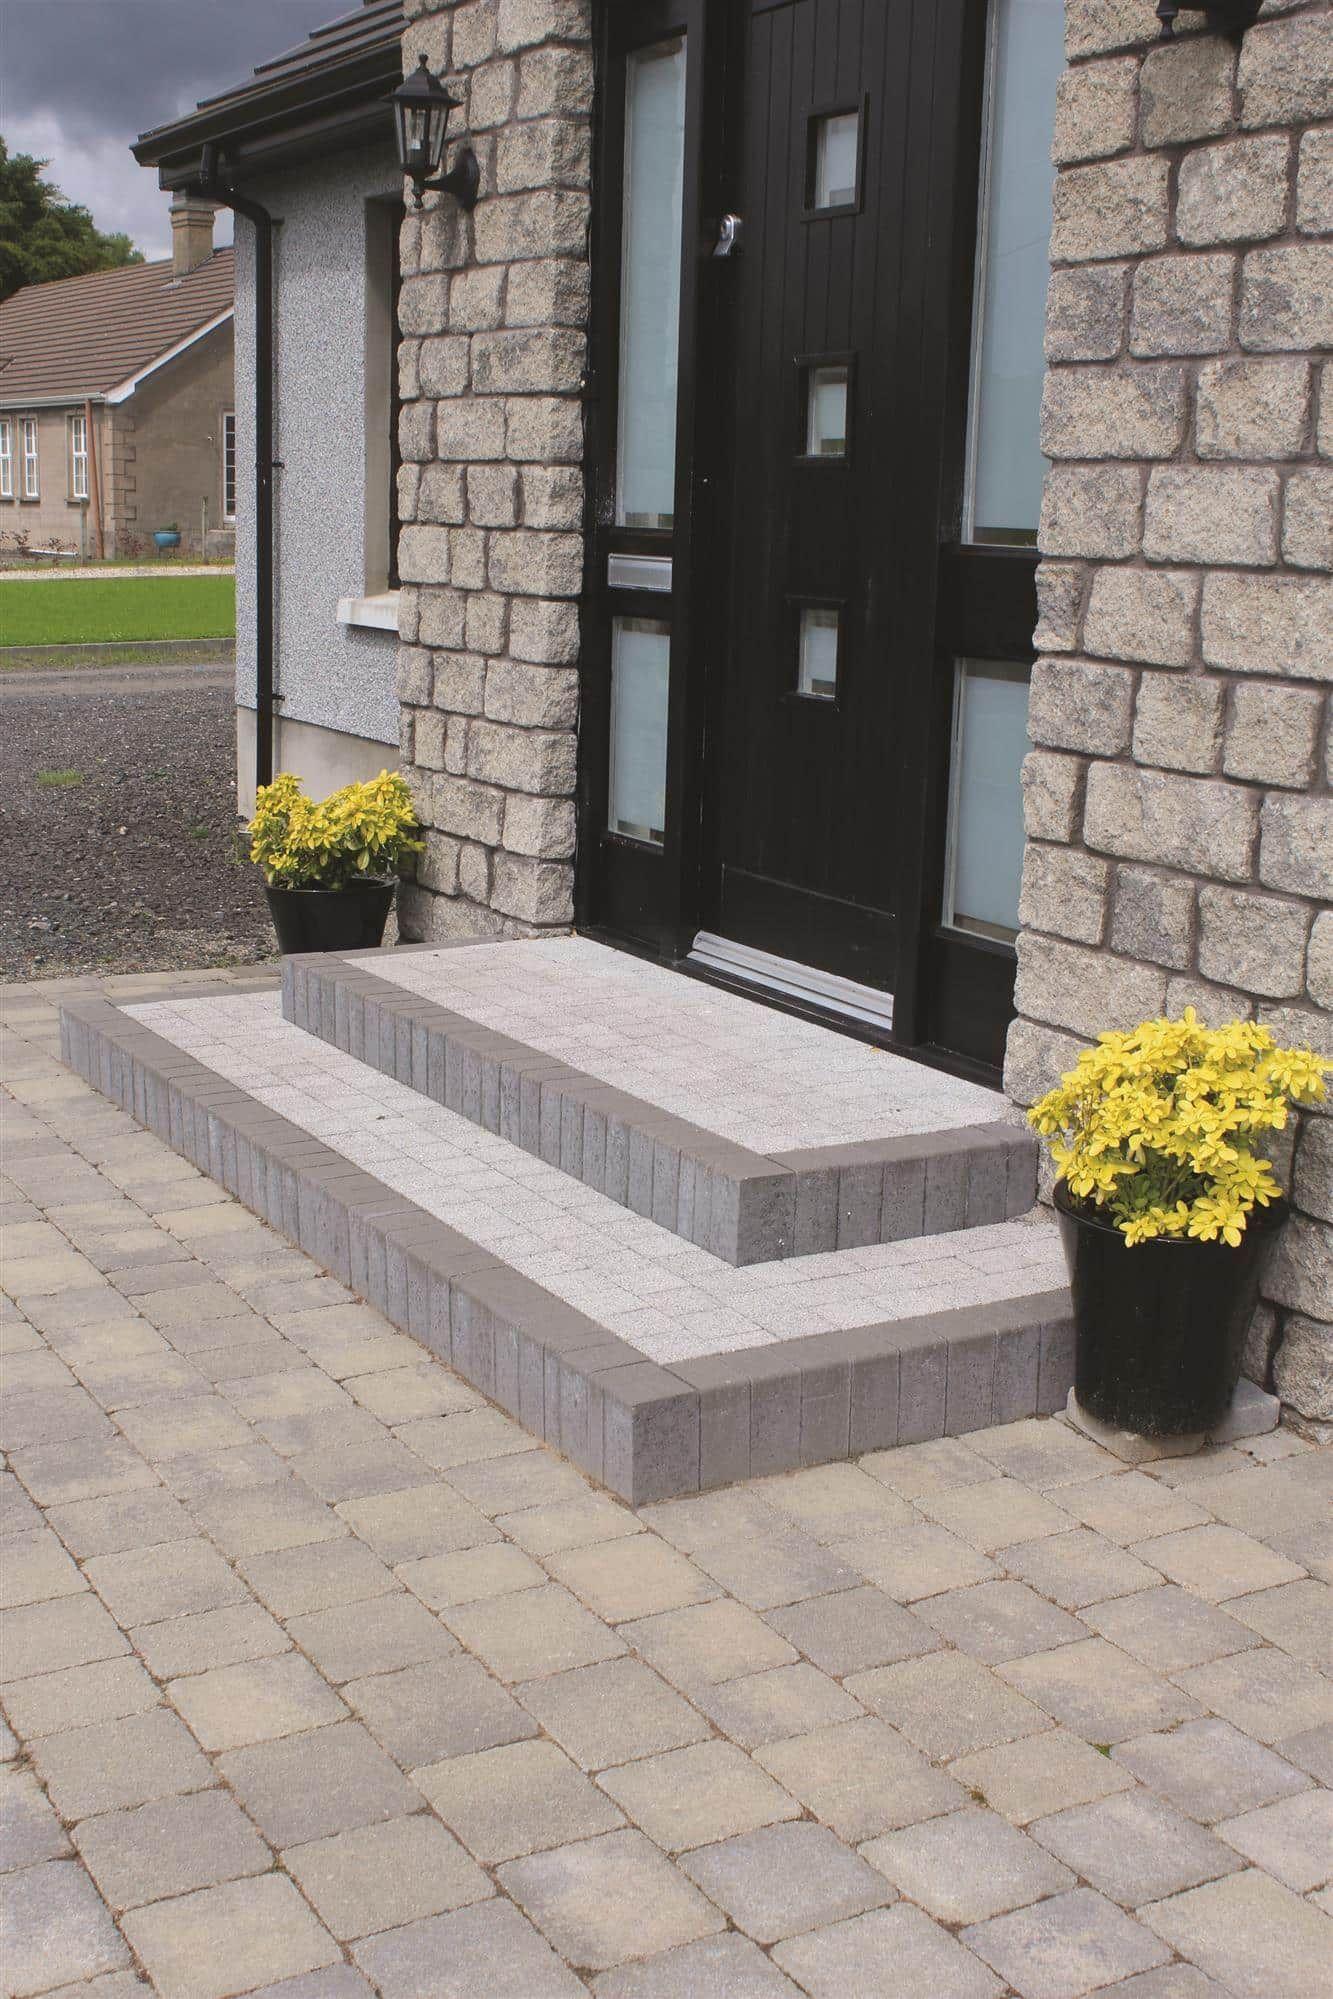 Cbf Cement Board Fabricators Residential Projects: Tobermore Country Stone Cedar & Slate, Tegula Slate